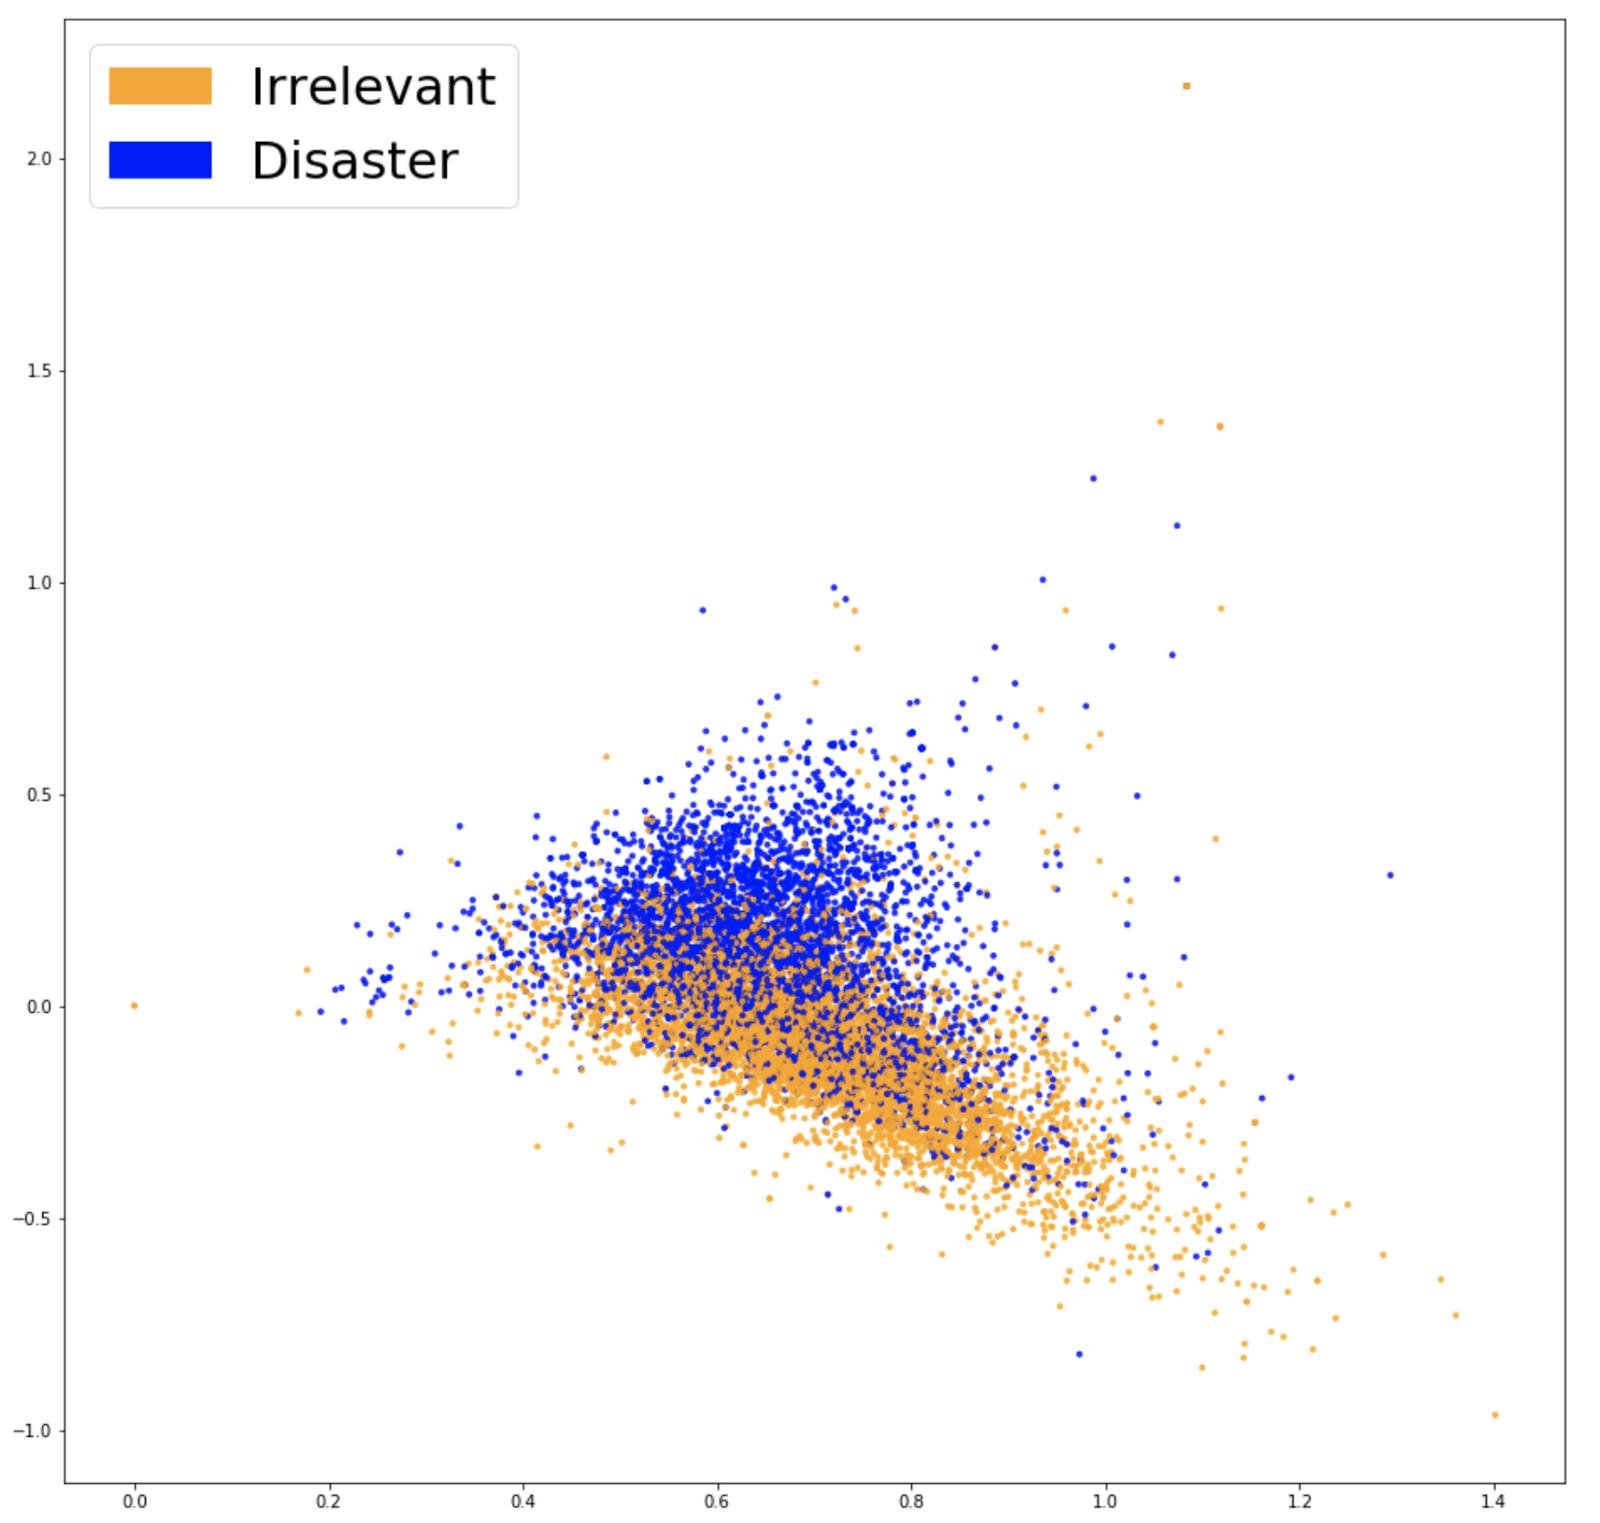 Visualizing Word2Vec embeddings